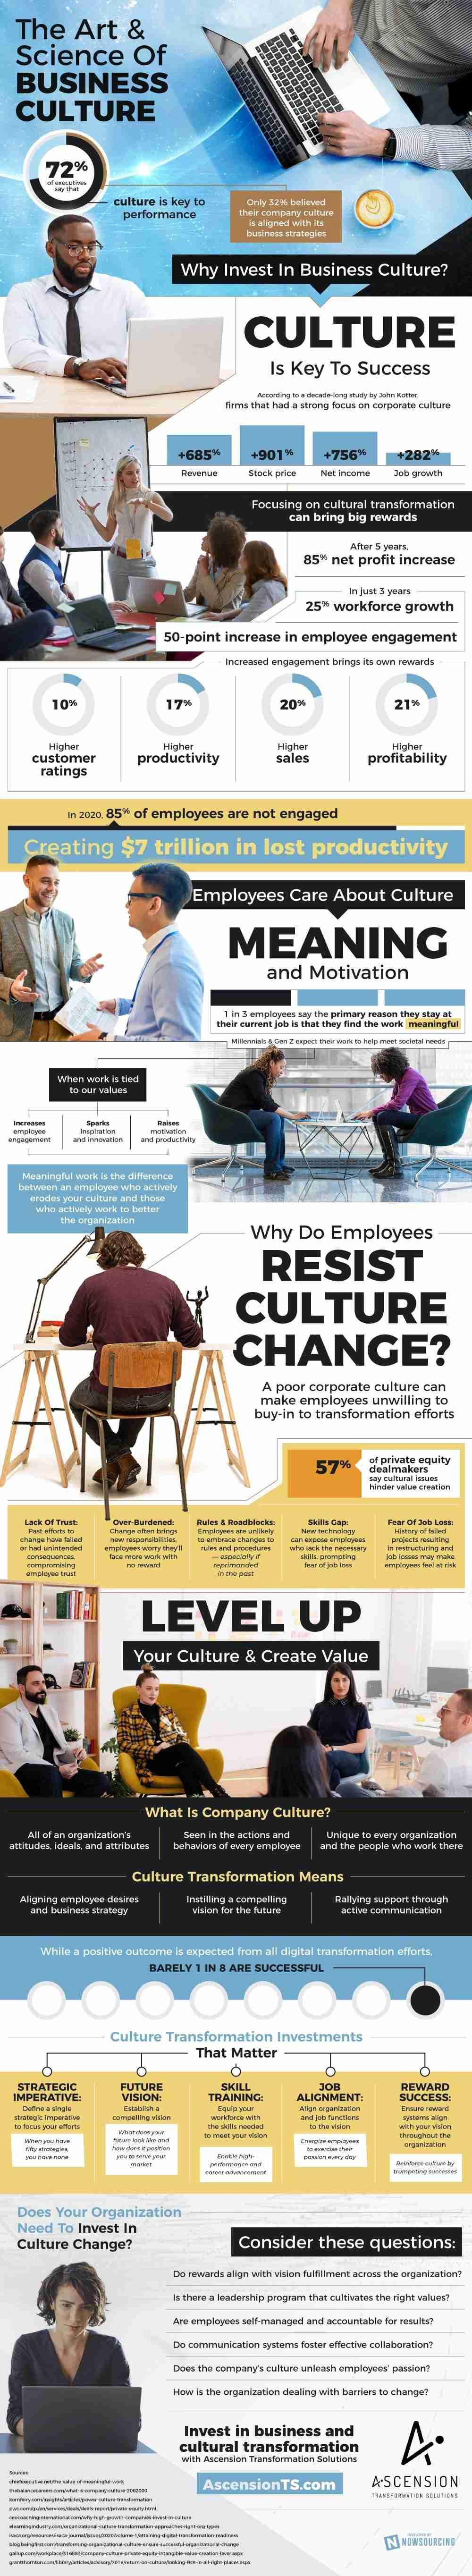 Consumers Love Corporate Culture